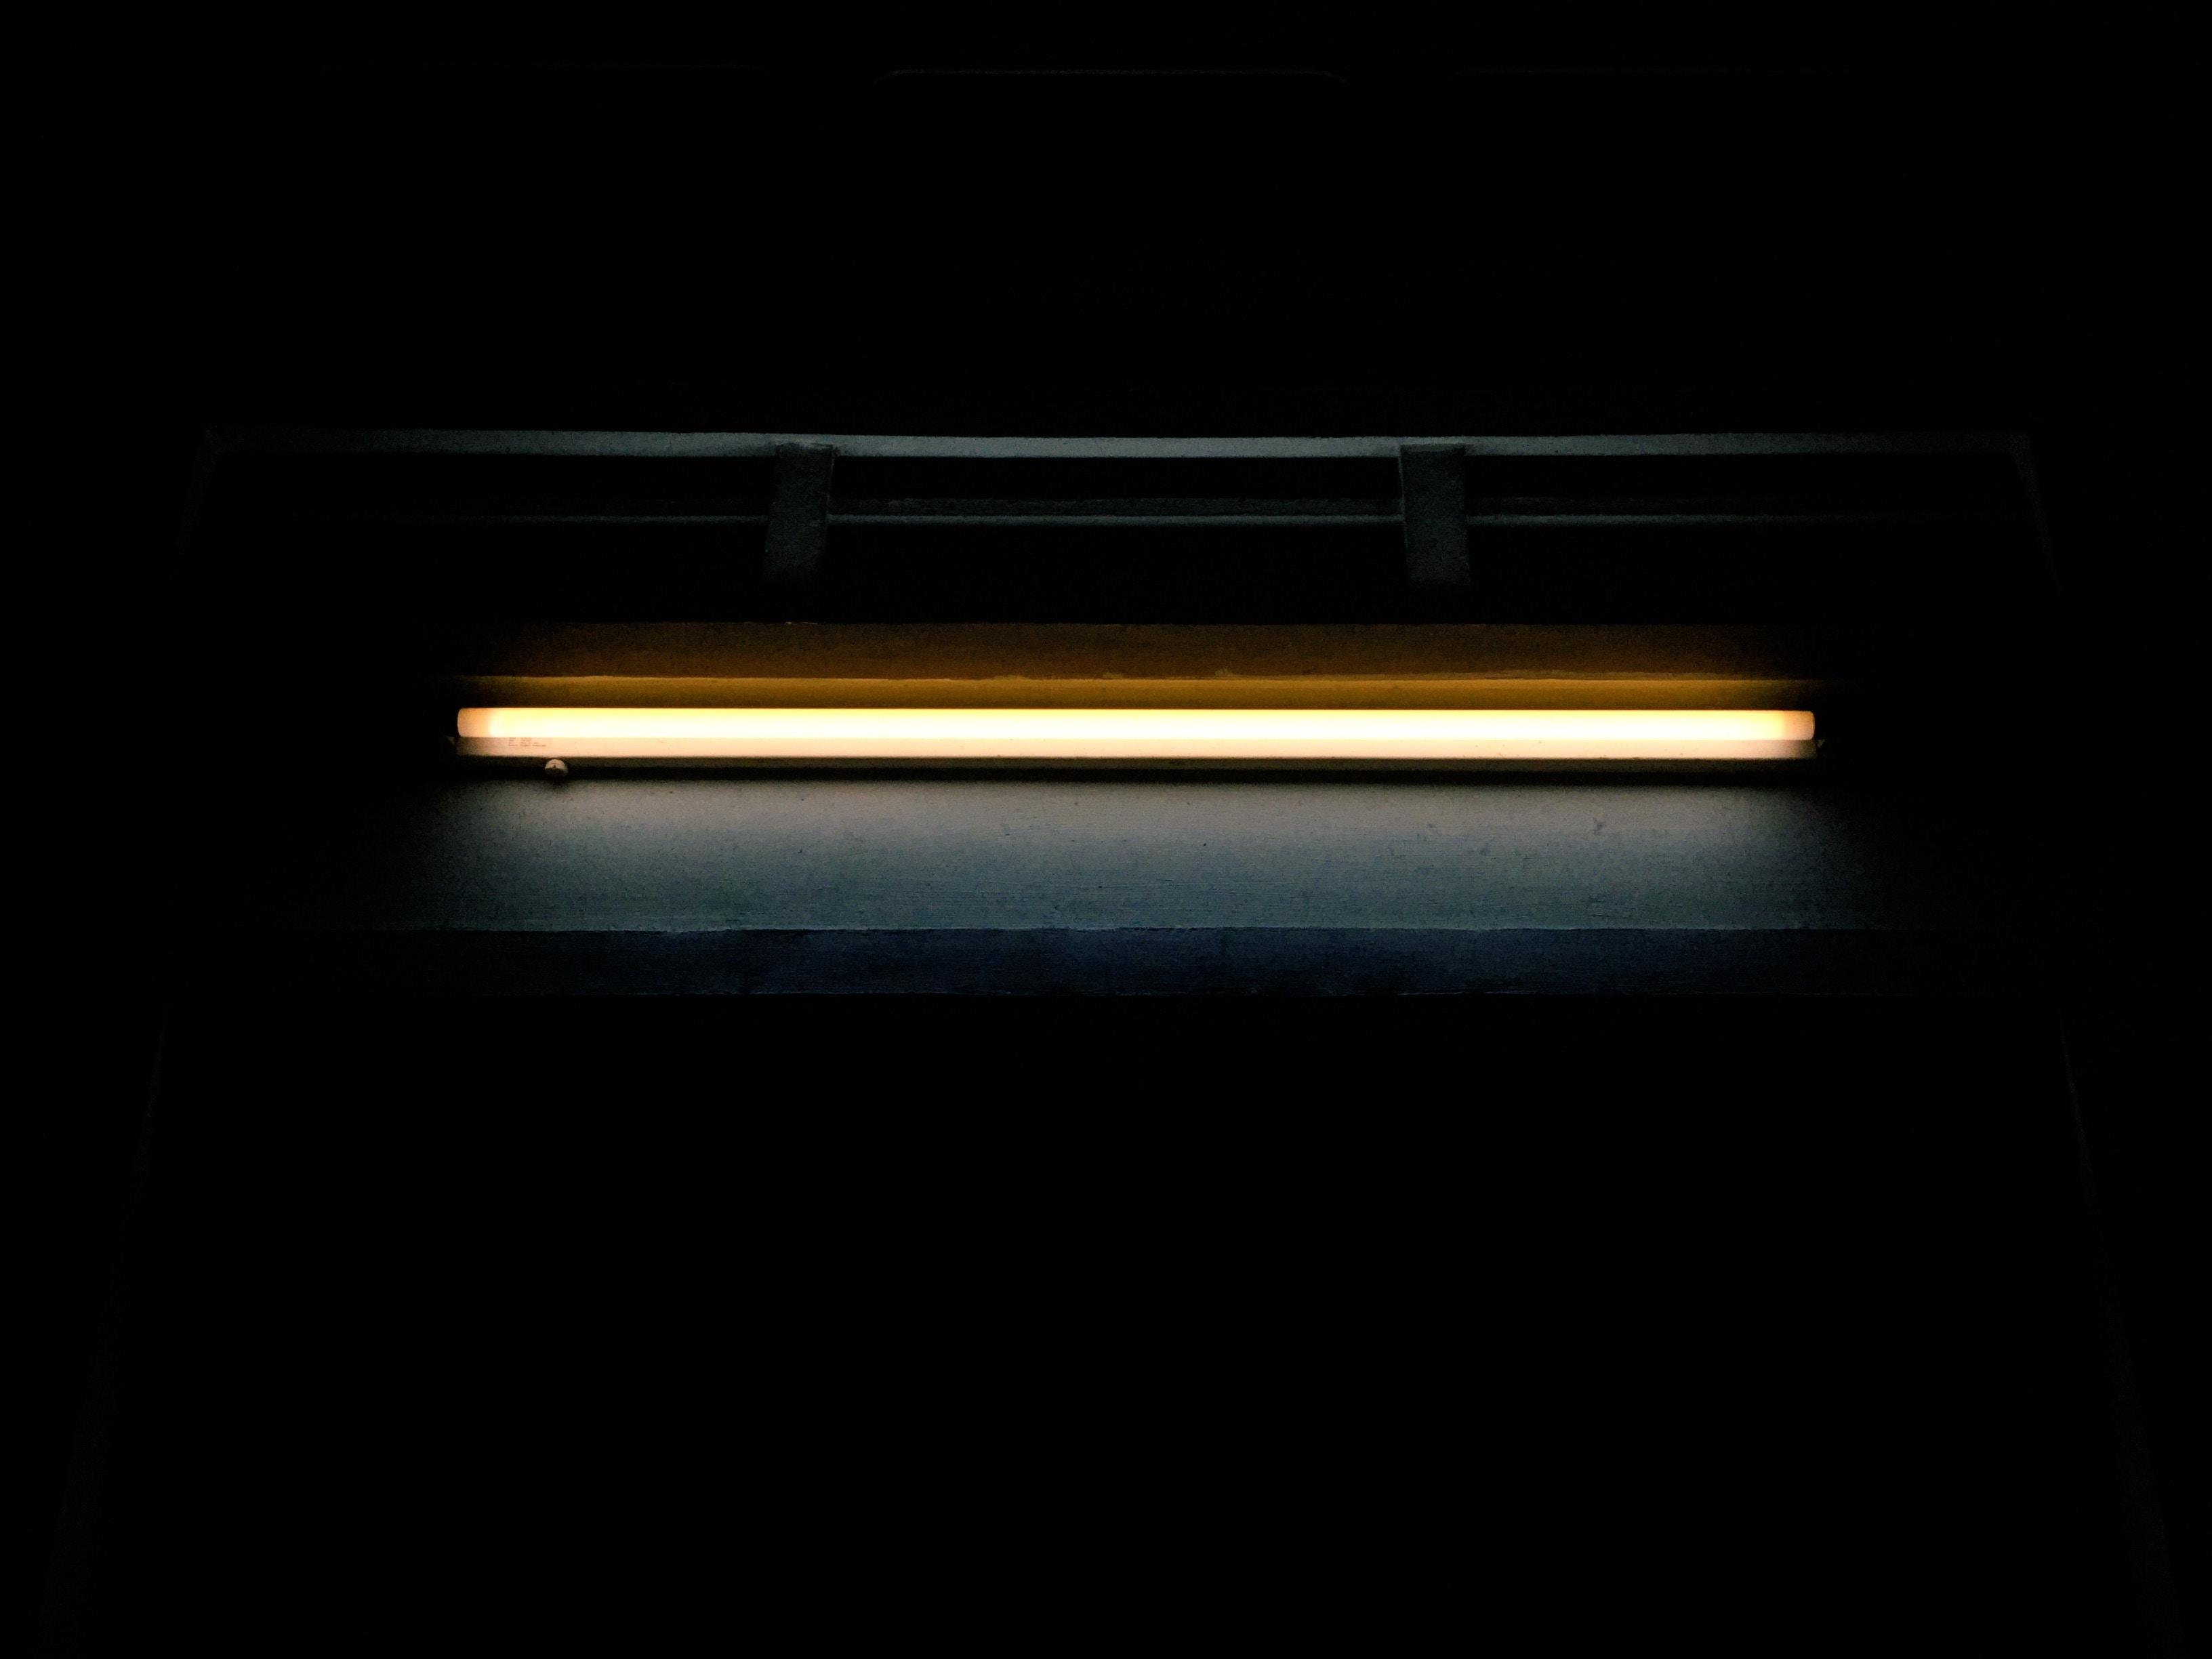 white fluorescent lamp